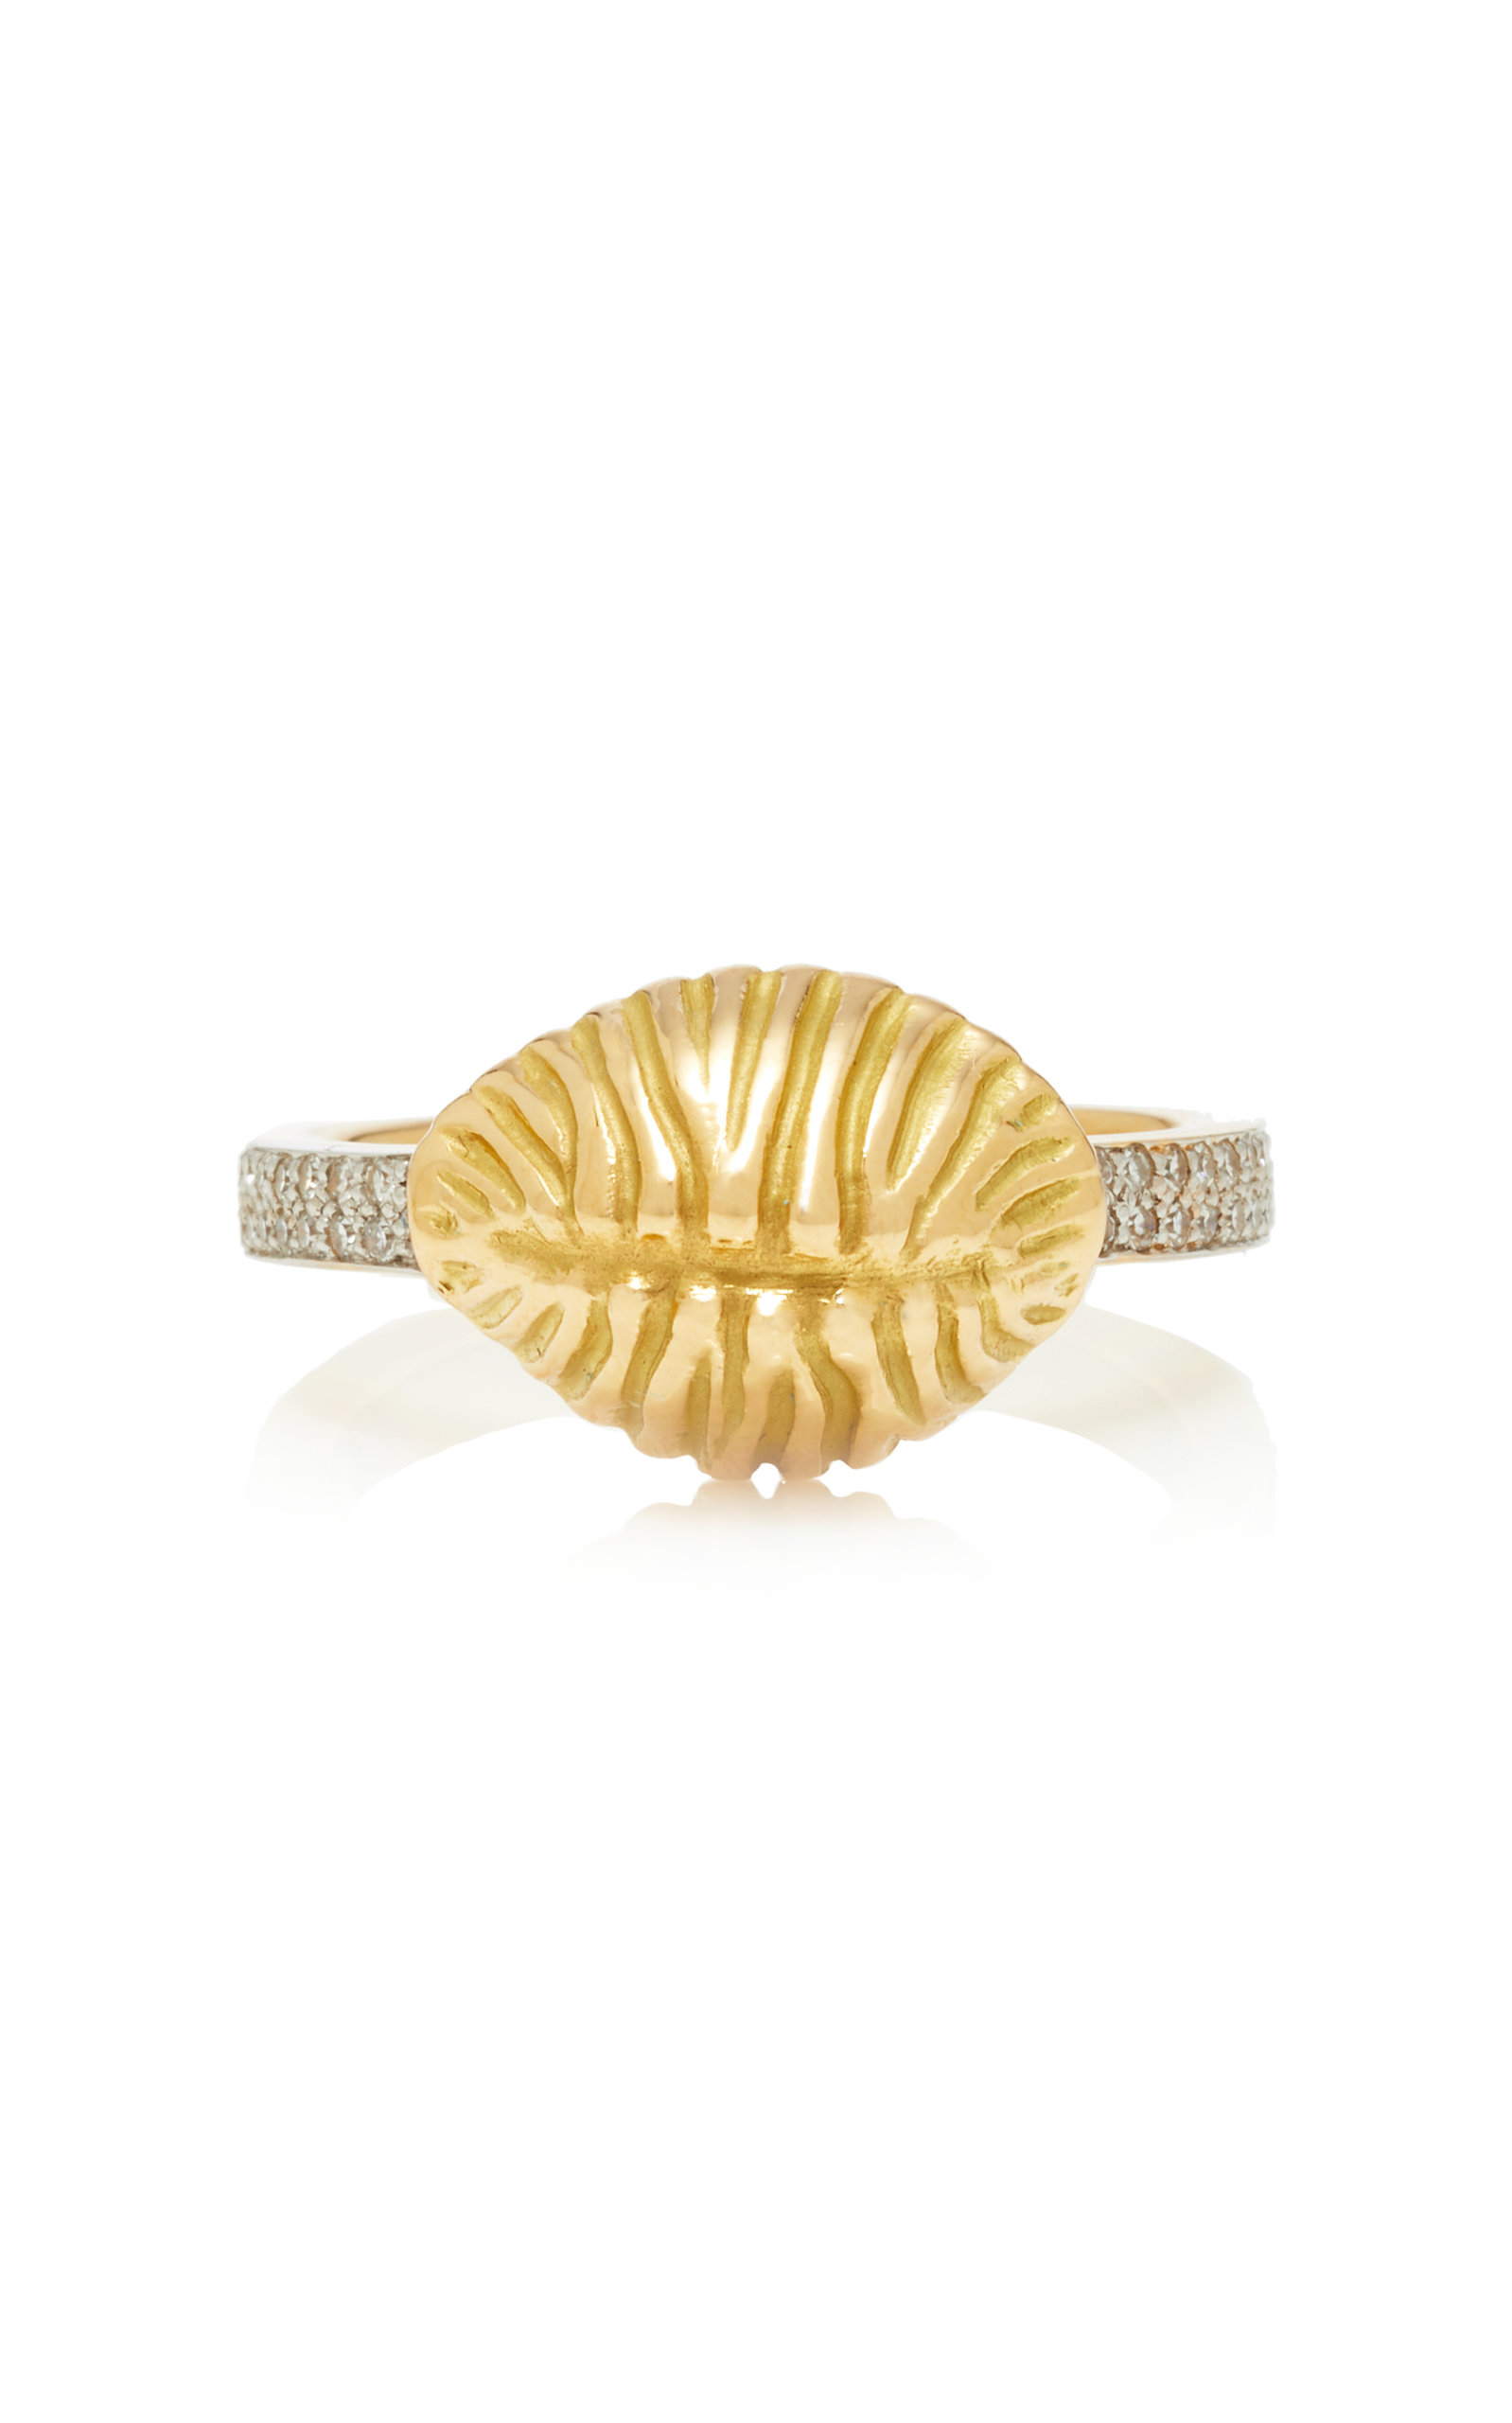 RENNA PERFECT IMPERFECT DIAMOND RING